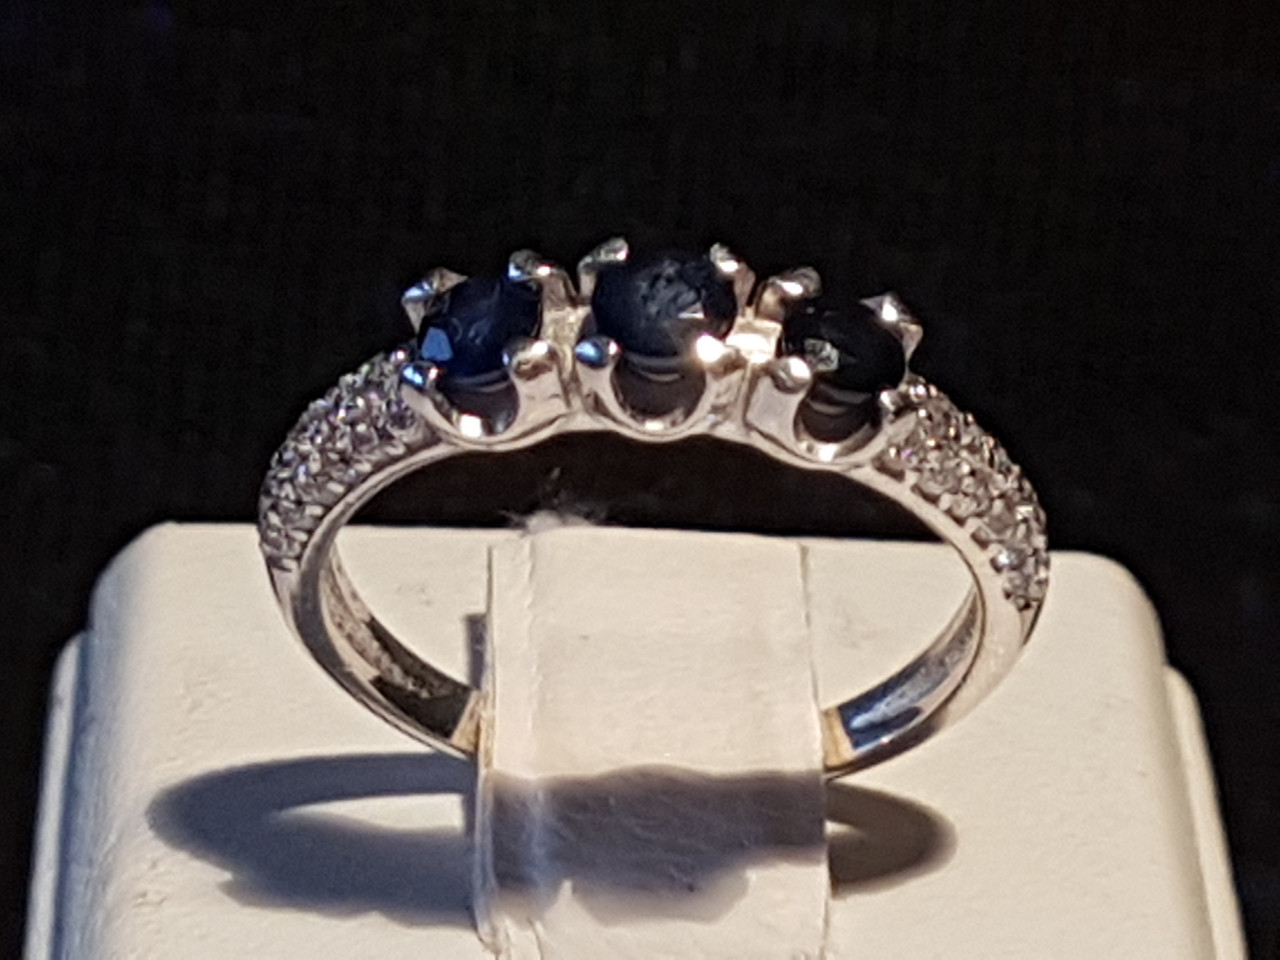 Серебряное кольцо Илона с сапфирами. Артикул 1631/9р-SPH